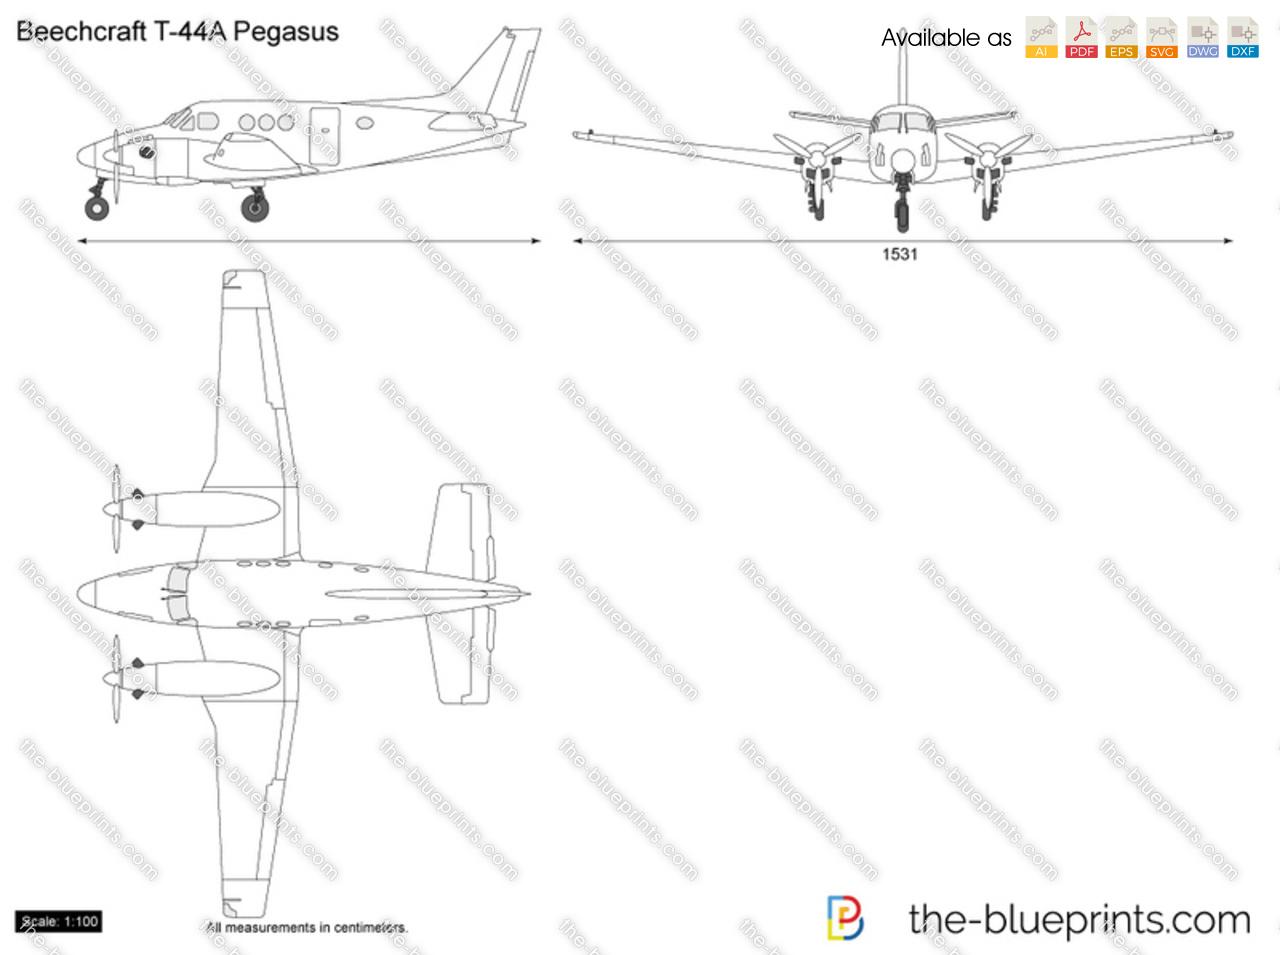 Beechcraft T-44A Pegasus